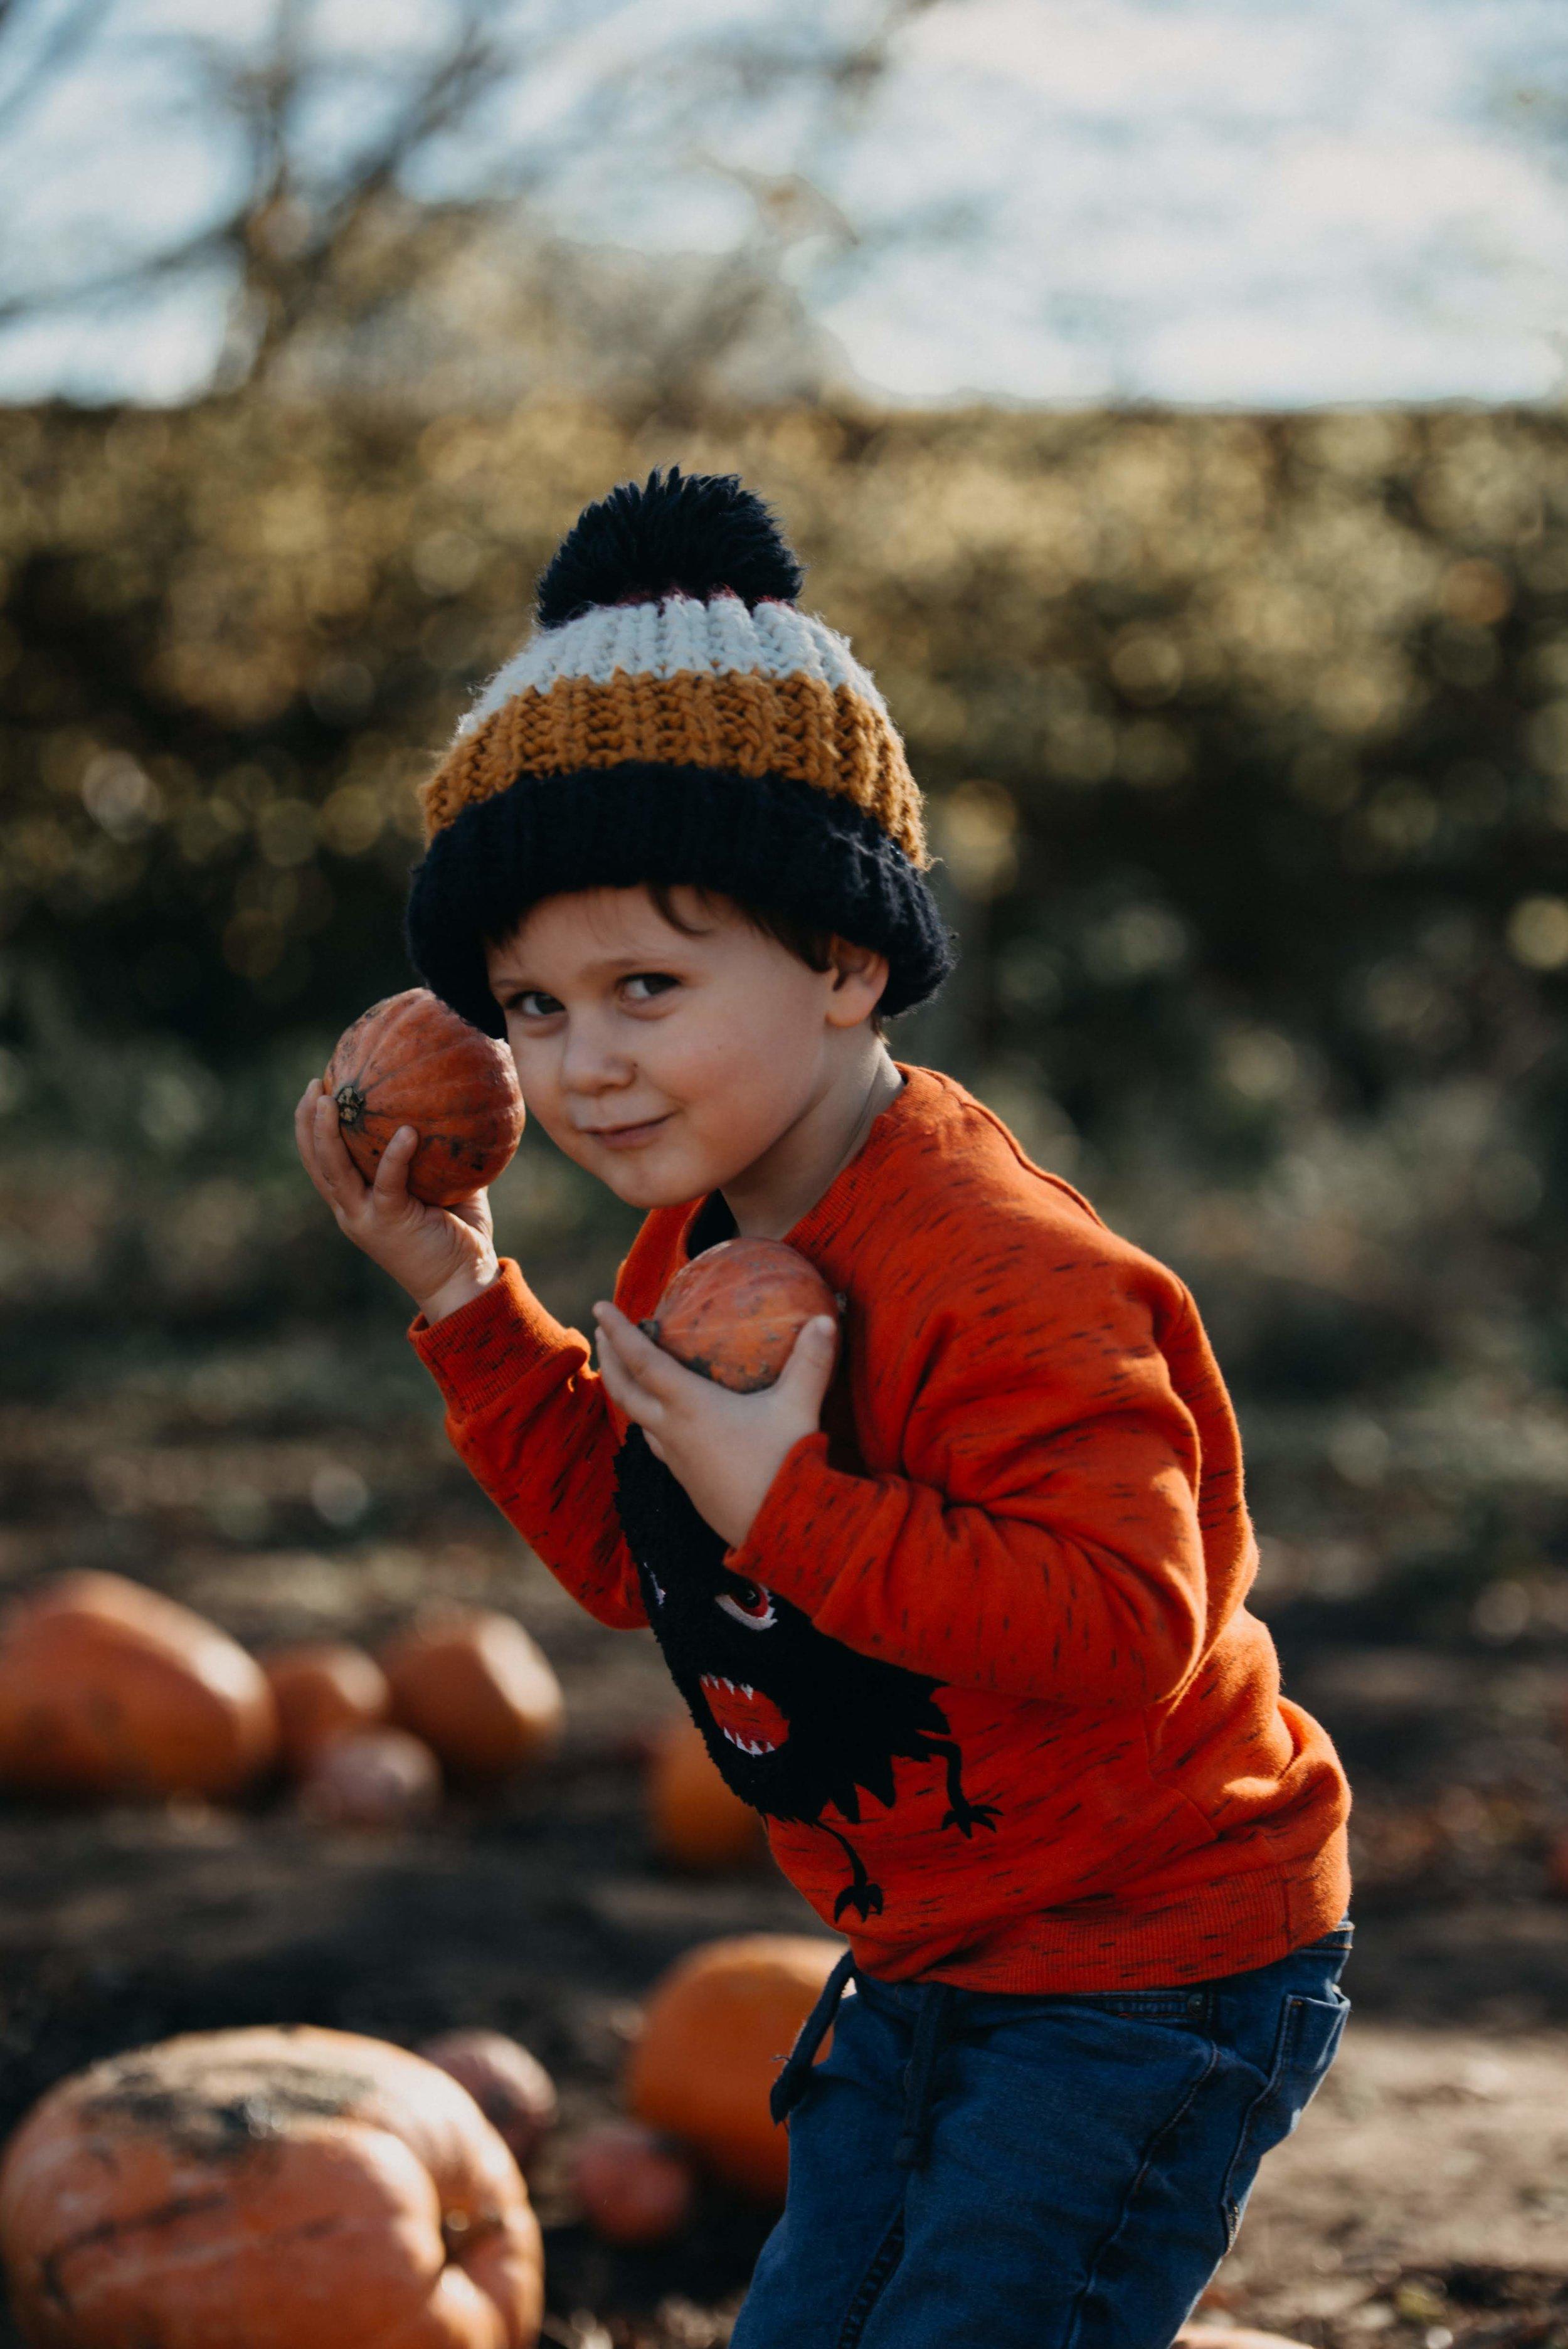 Pumpkin picking with Jesse, October 2018 - 18.jpg